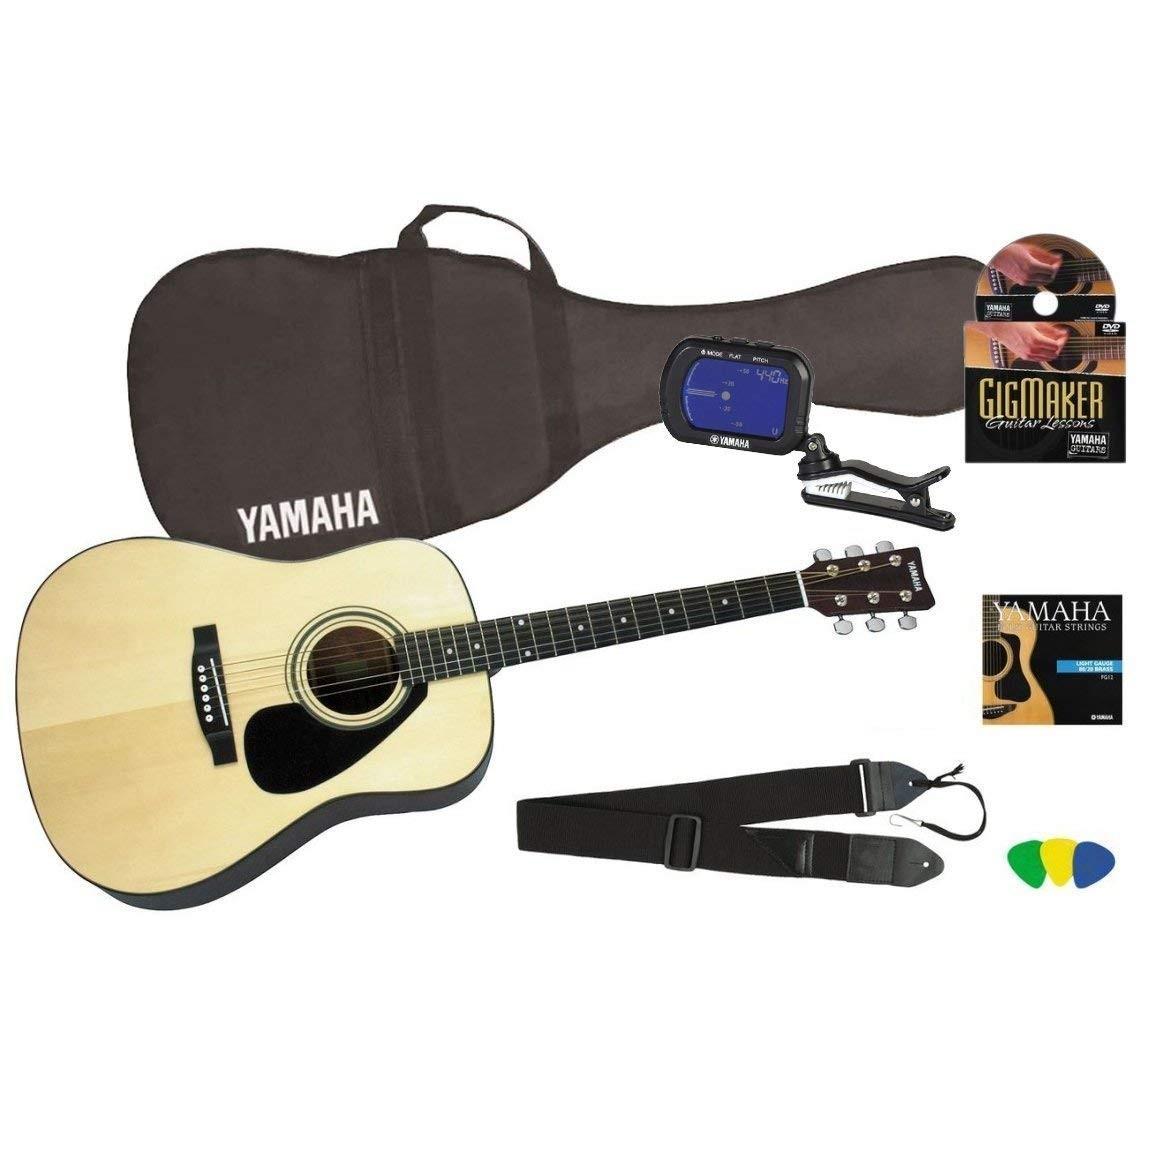 Yamaha Gigmaker Acoustic bundle